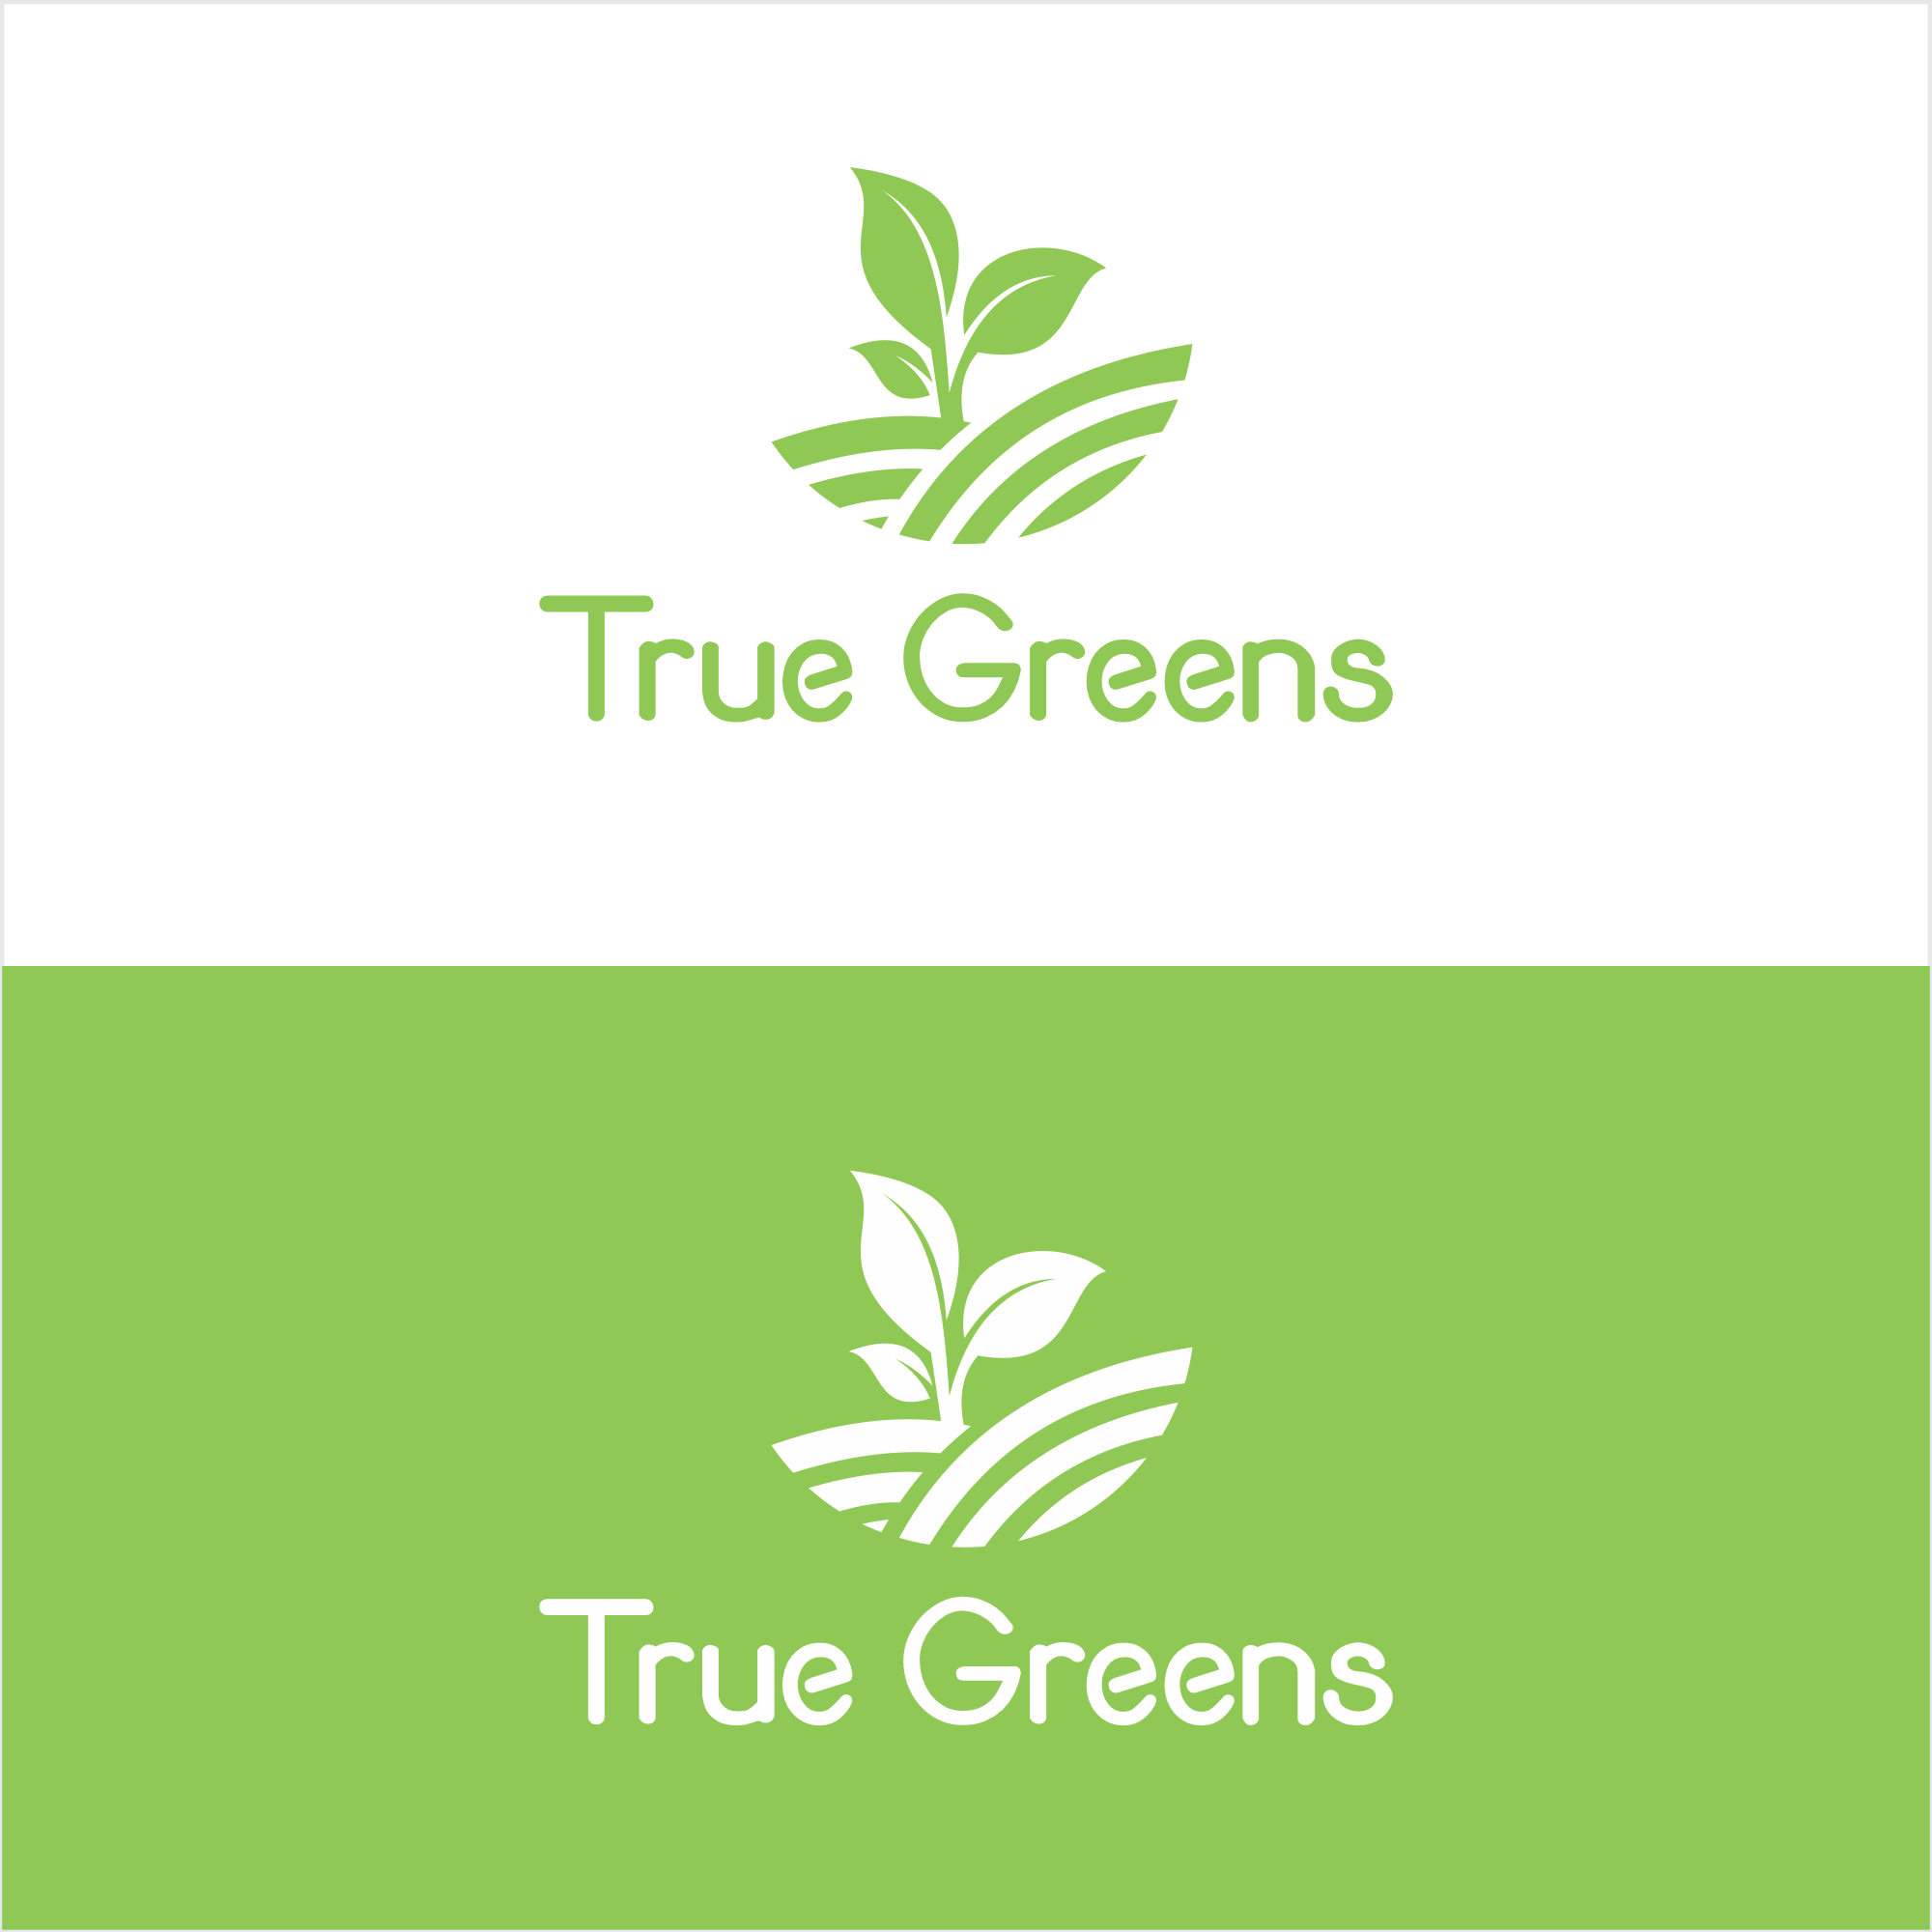 🌱 Logo for plant based, organic food producer